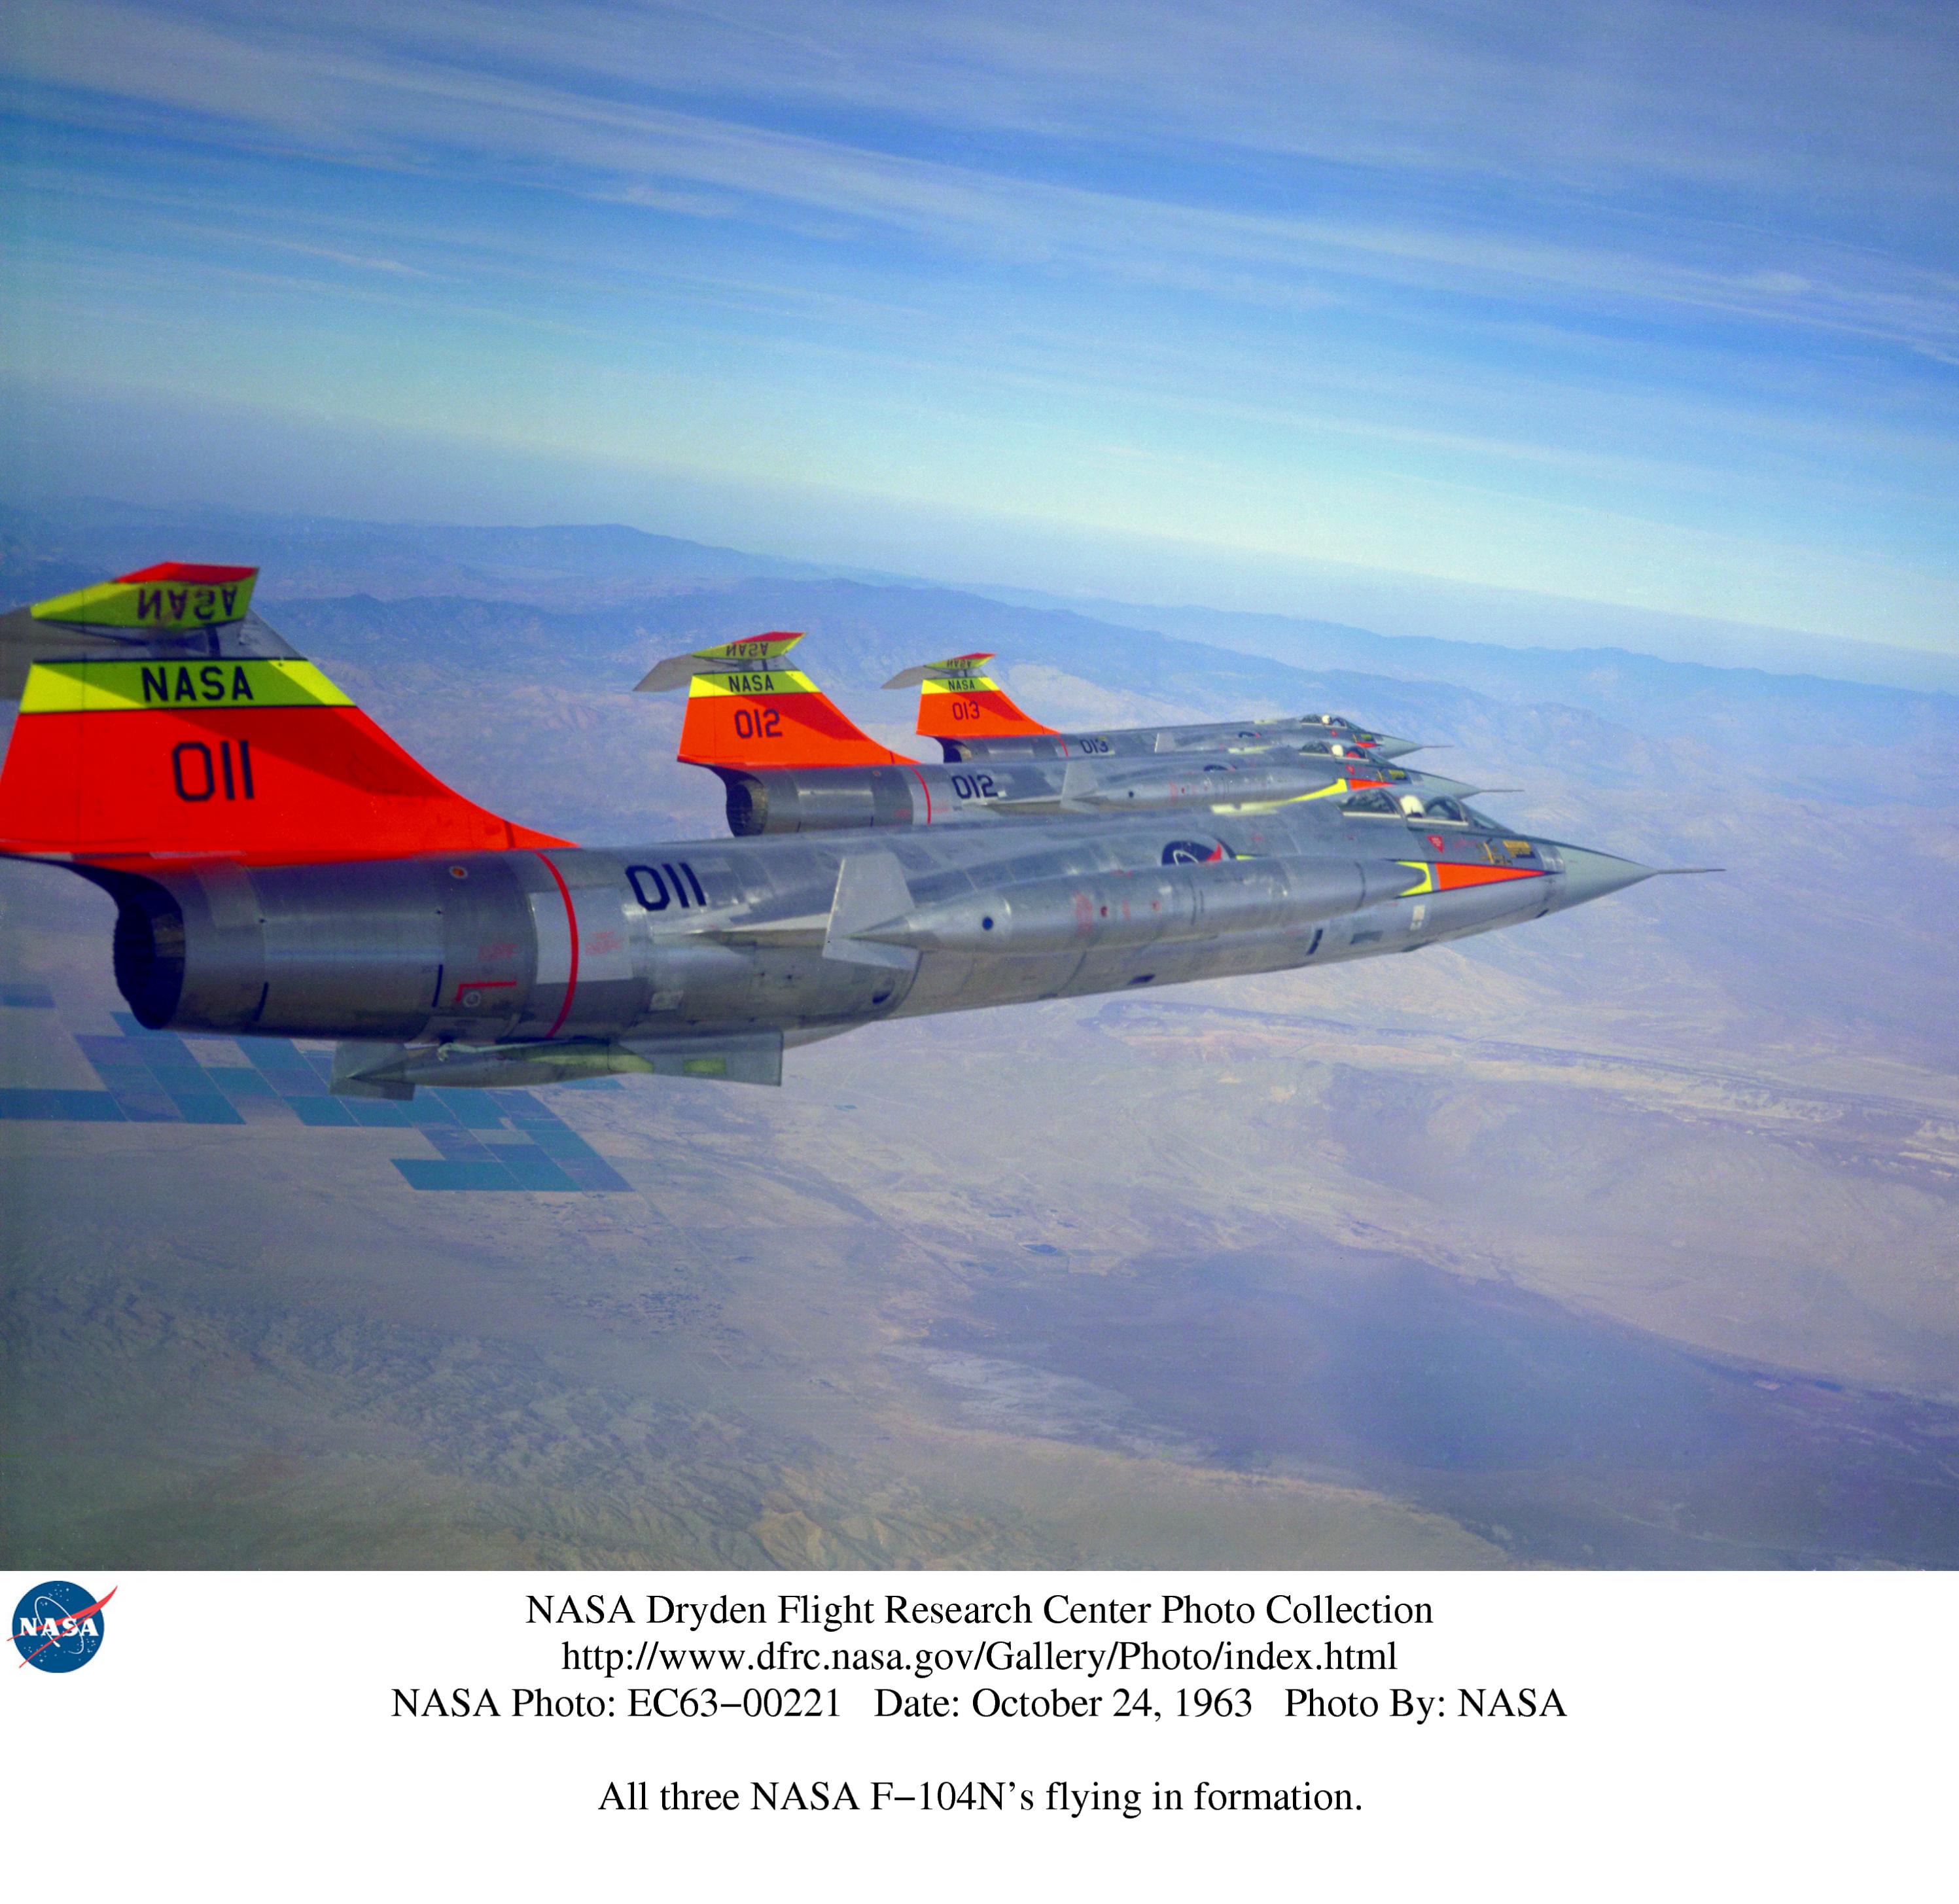 nasa f-104a - photo #41